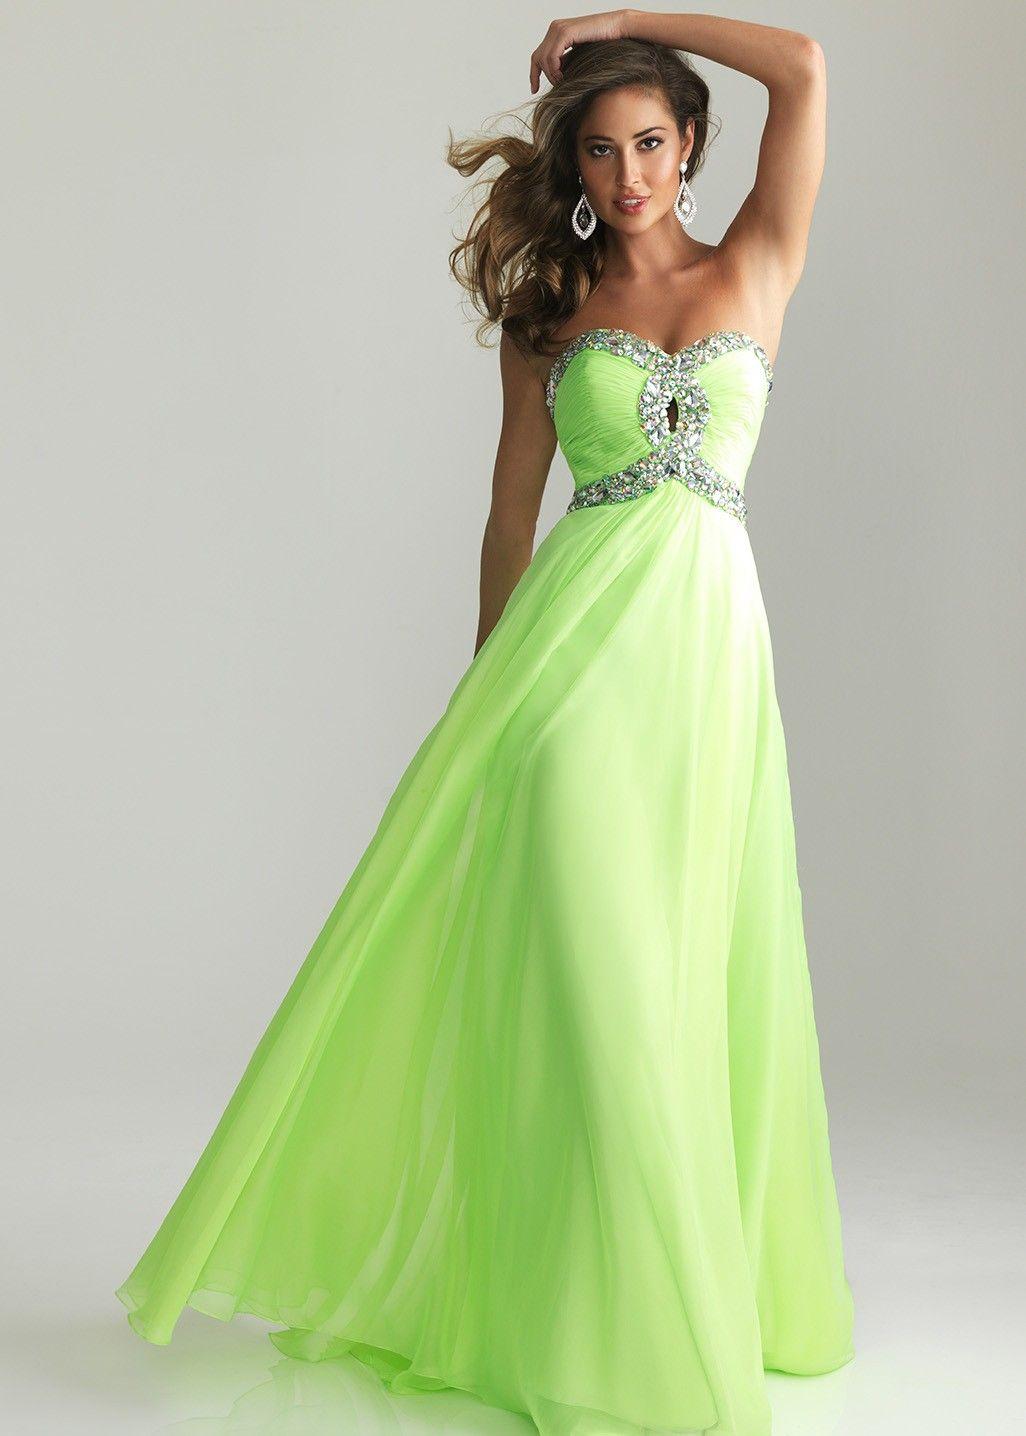 Lime Green Bridesmaid Dress - Love this. | Green and Shades ...